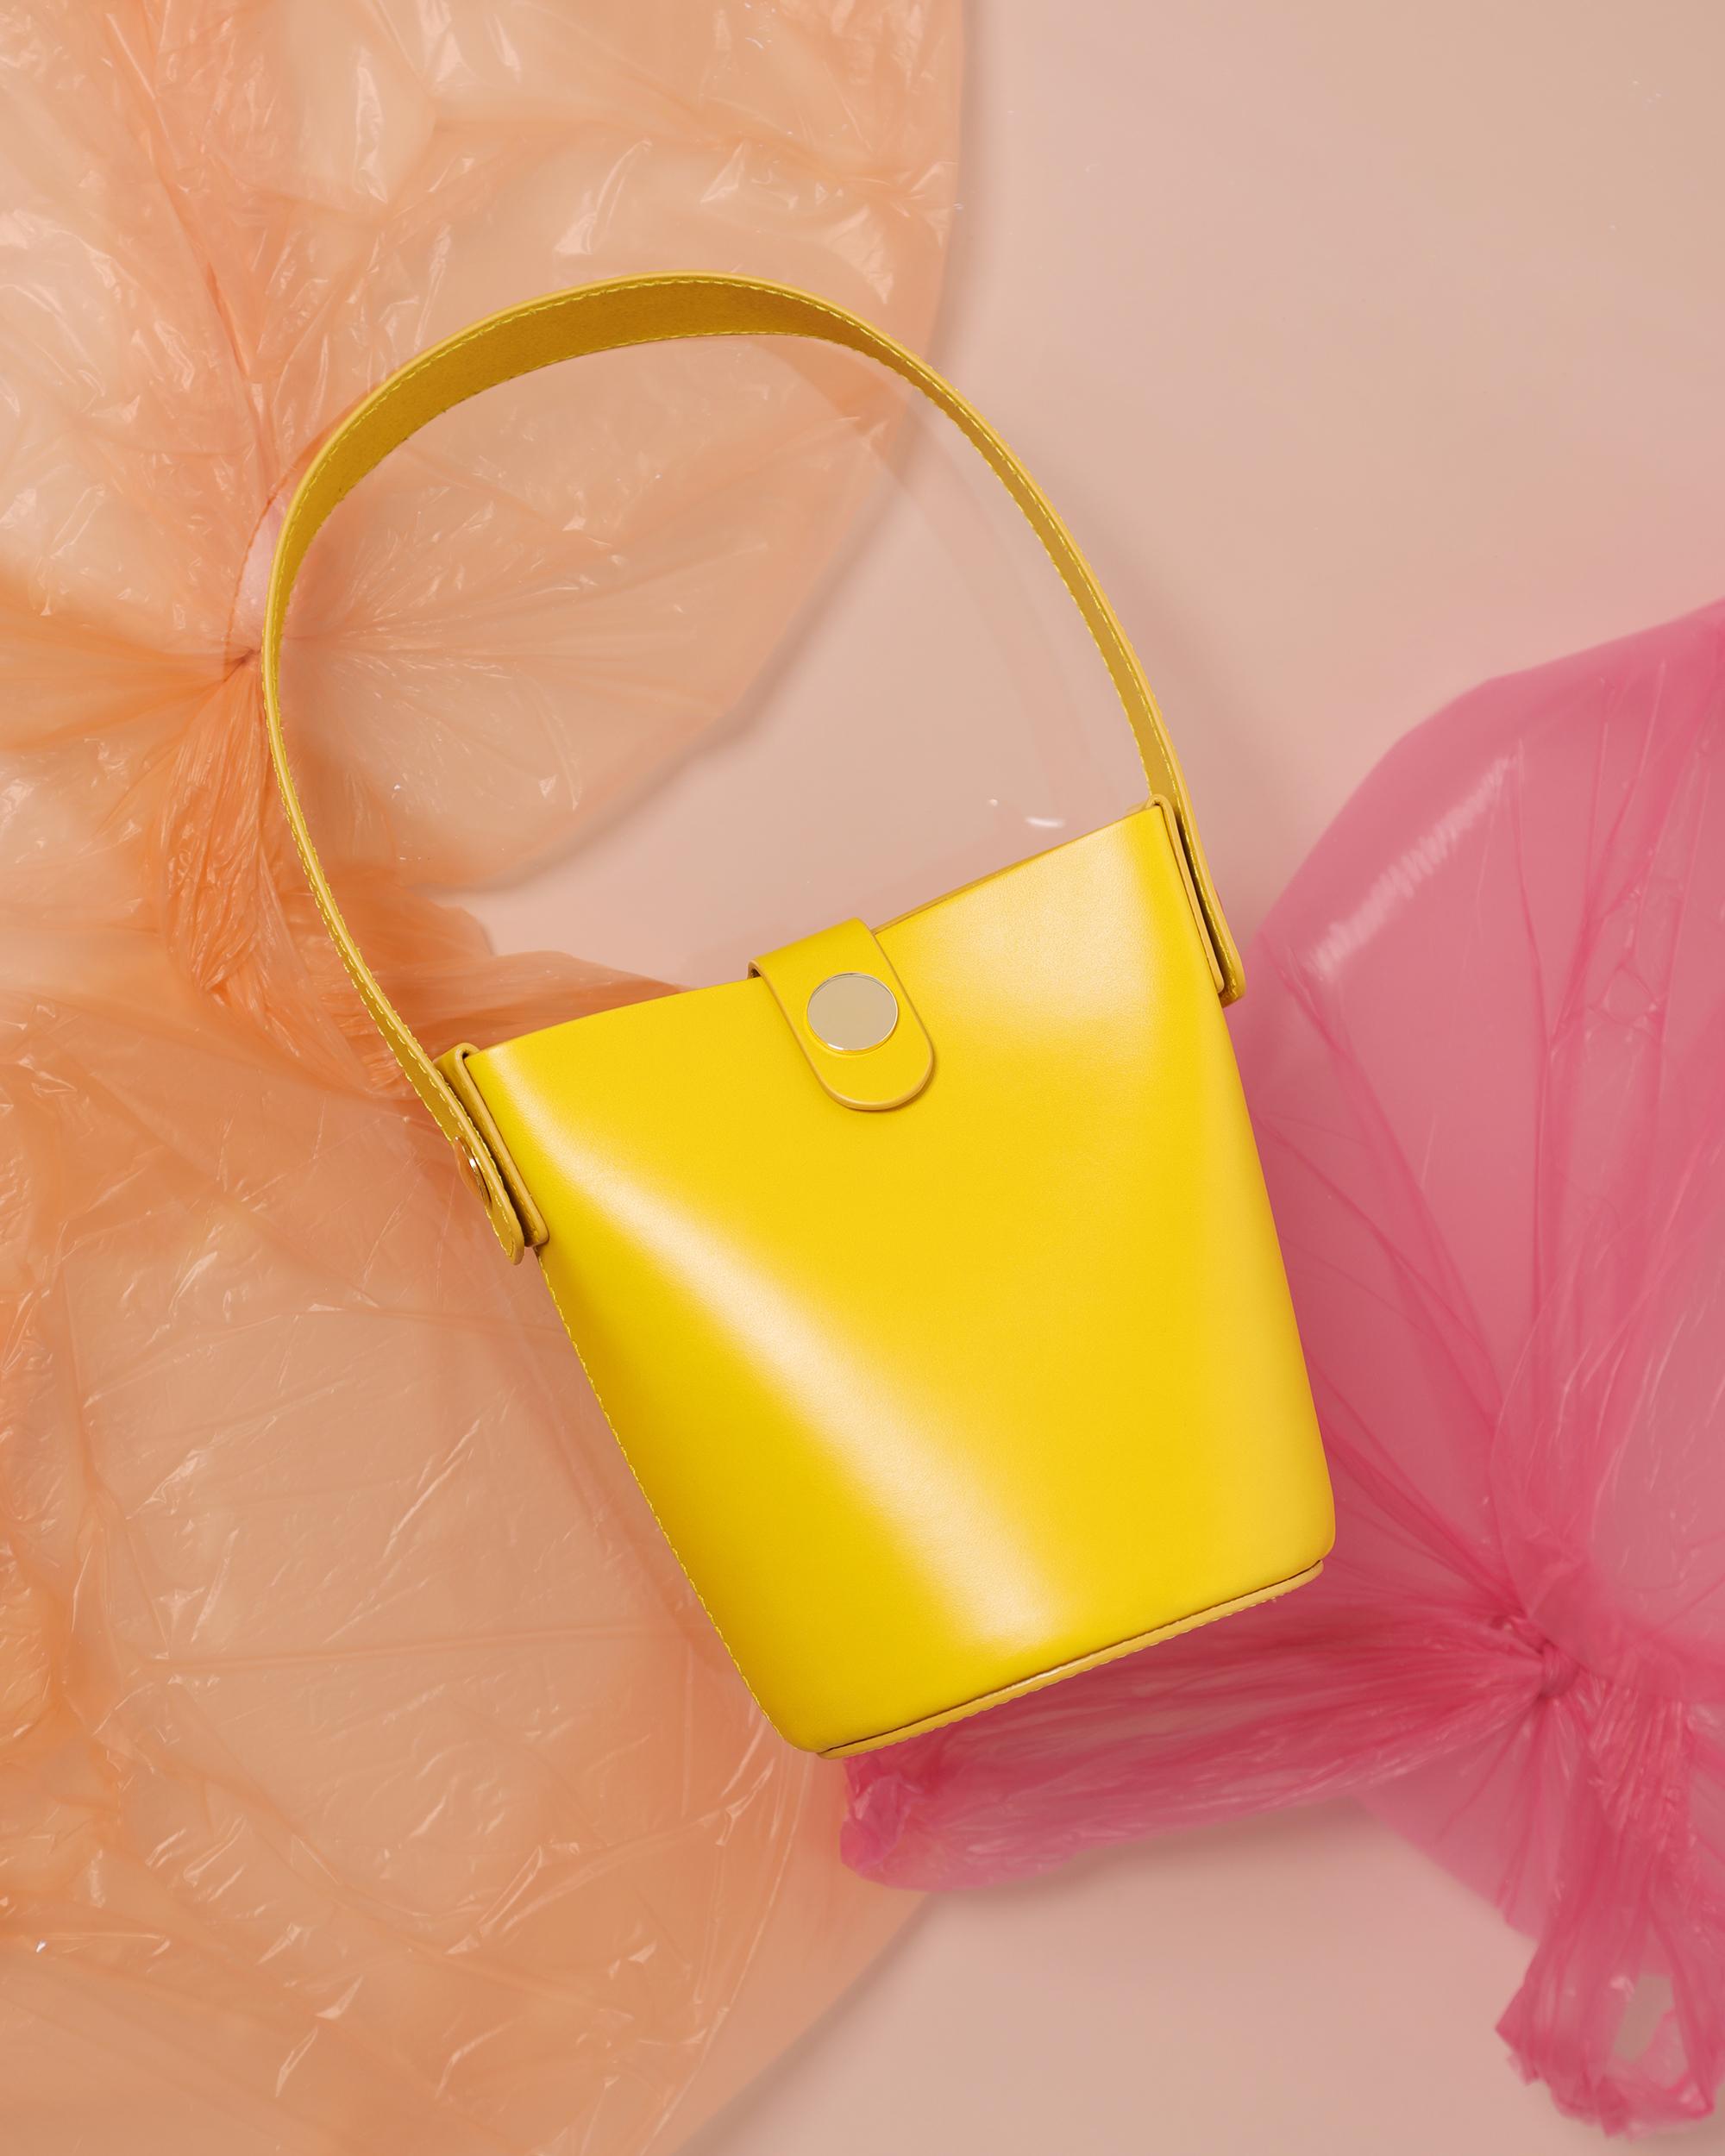 plastic bags and handbags